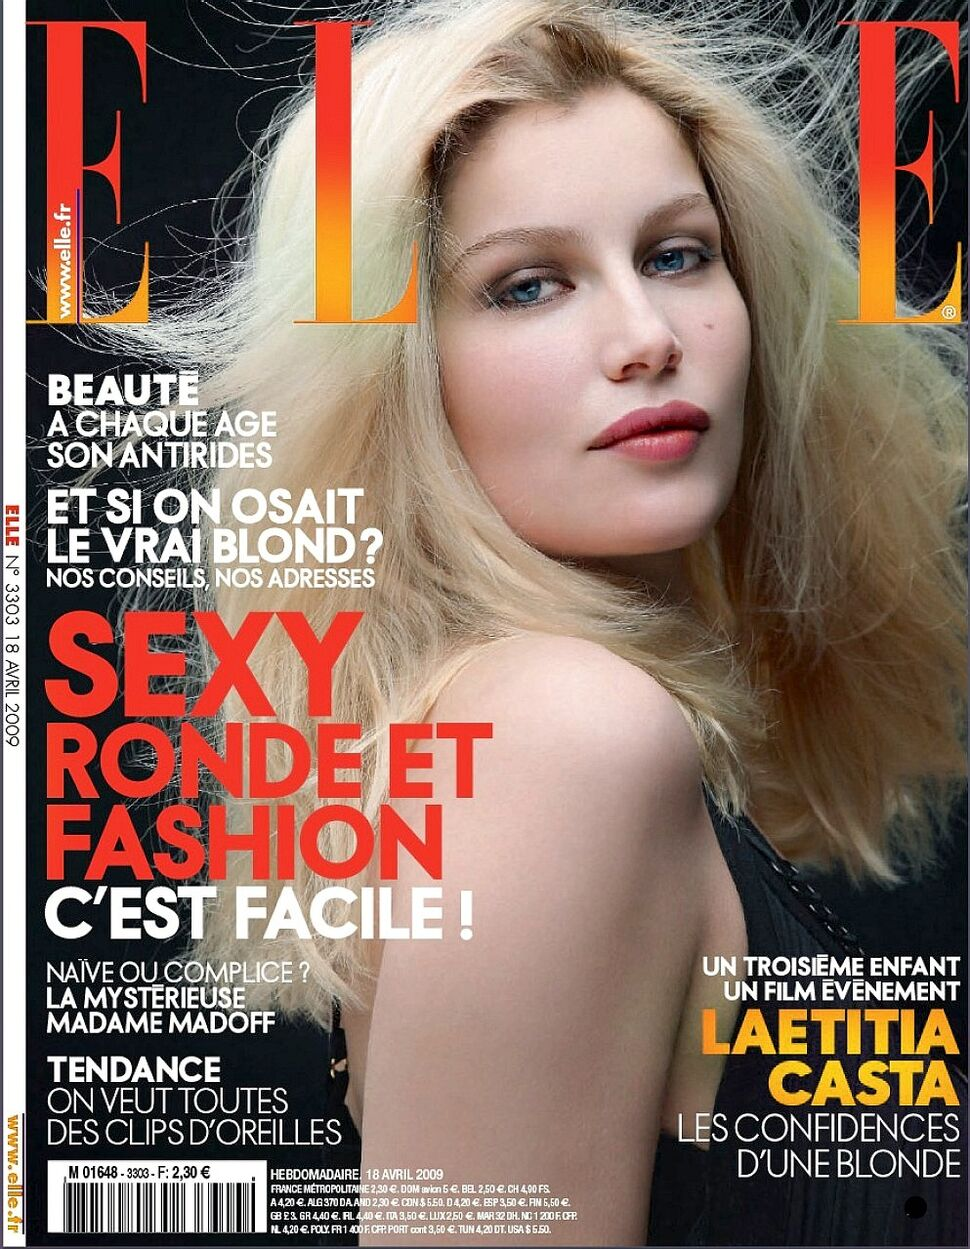 Летиция Каста в журнале Elle Франция. Апрель 2009